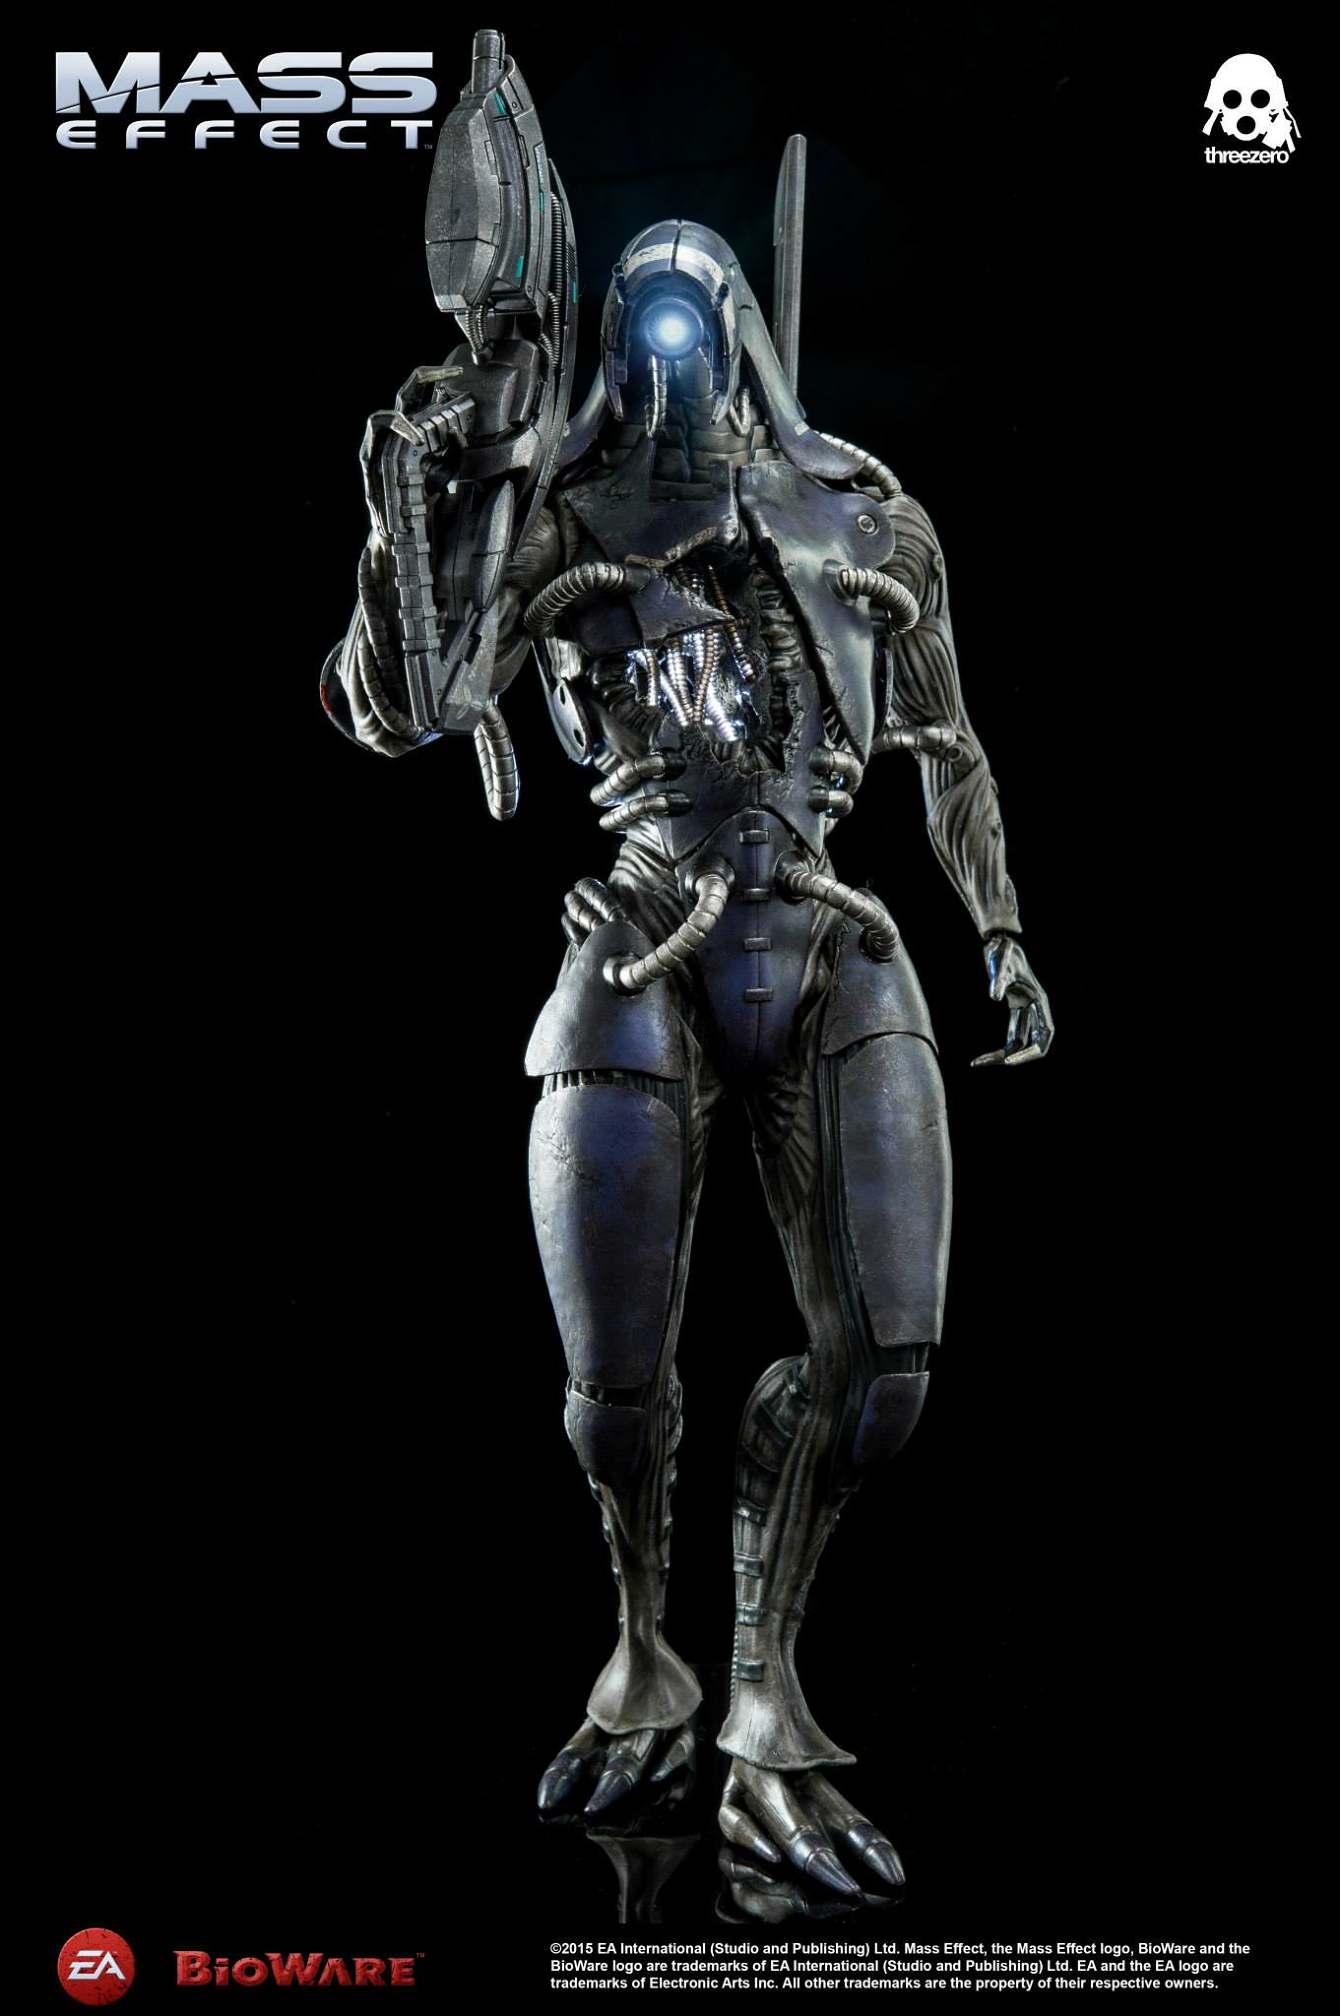 ThreeZero-Bioware-video-game-Legion-Mass-Effect-figure-4_1340_c.jpg